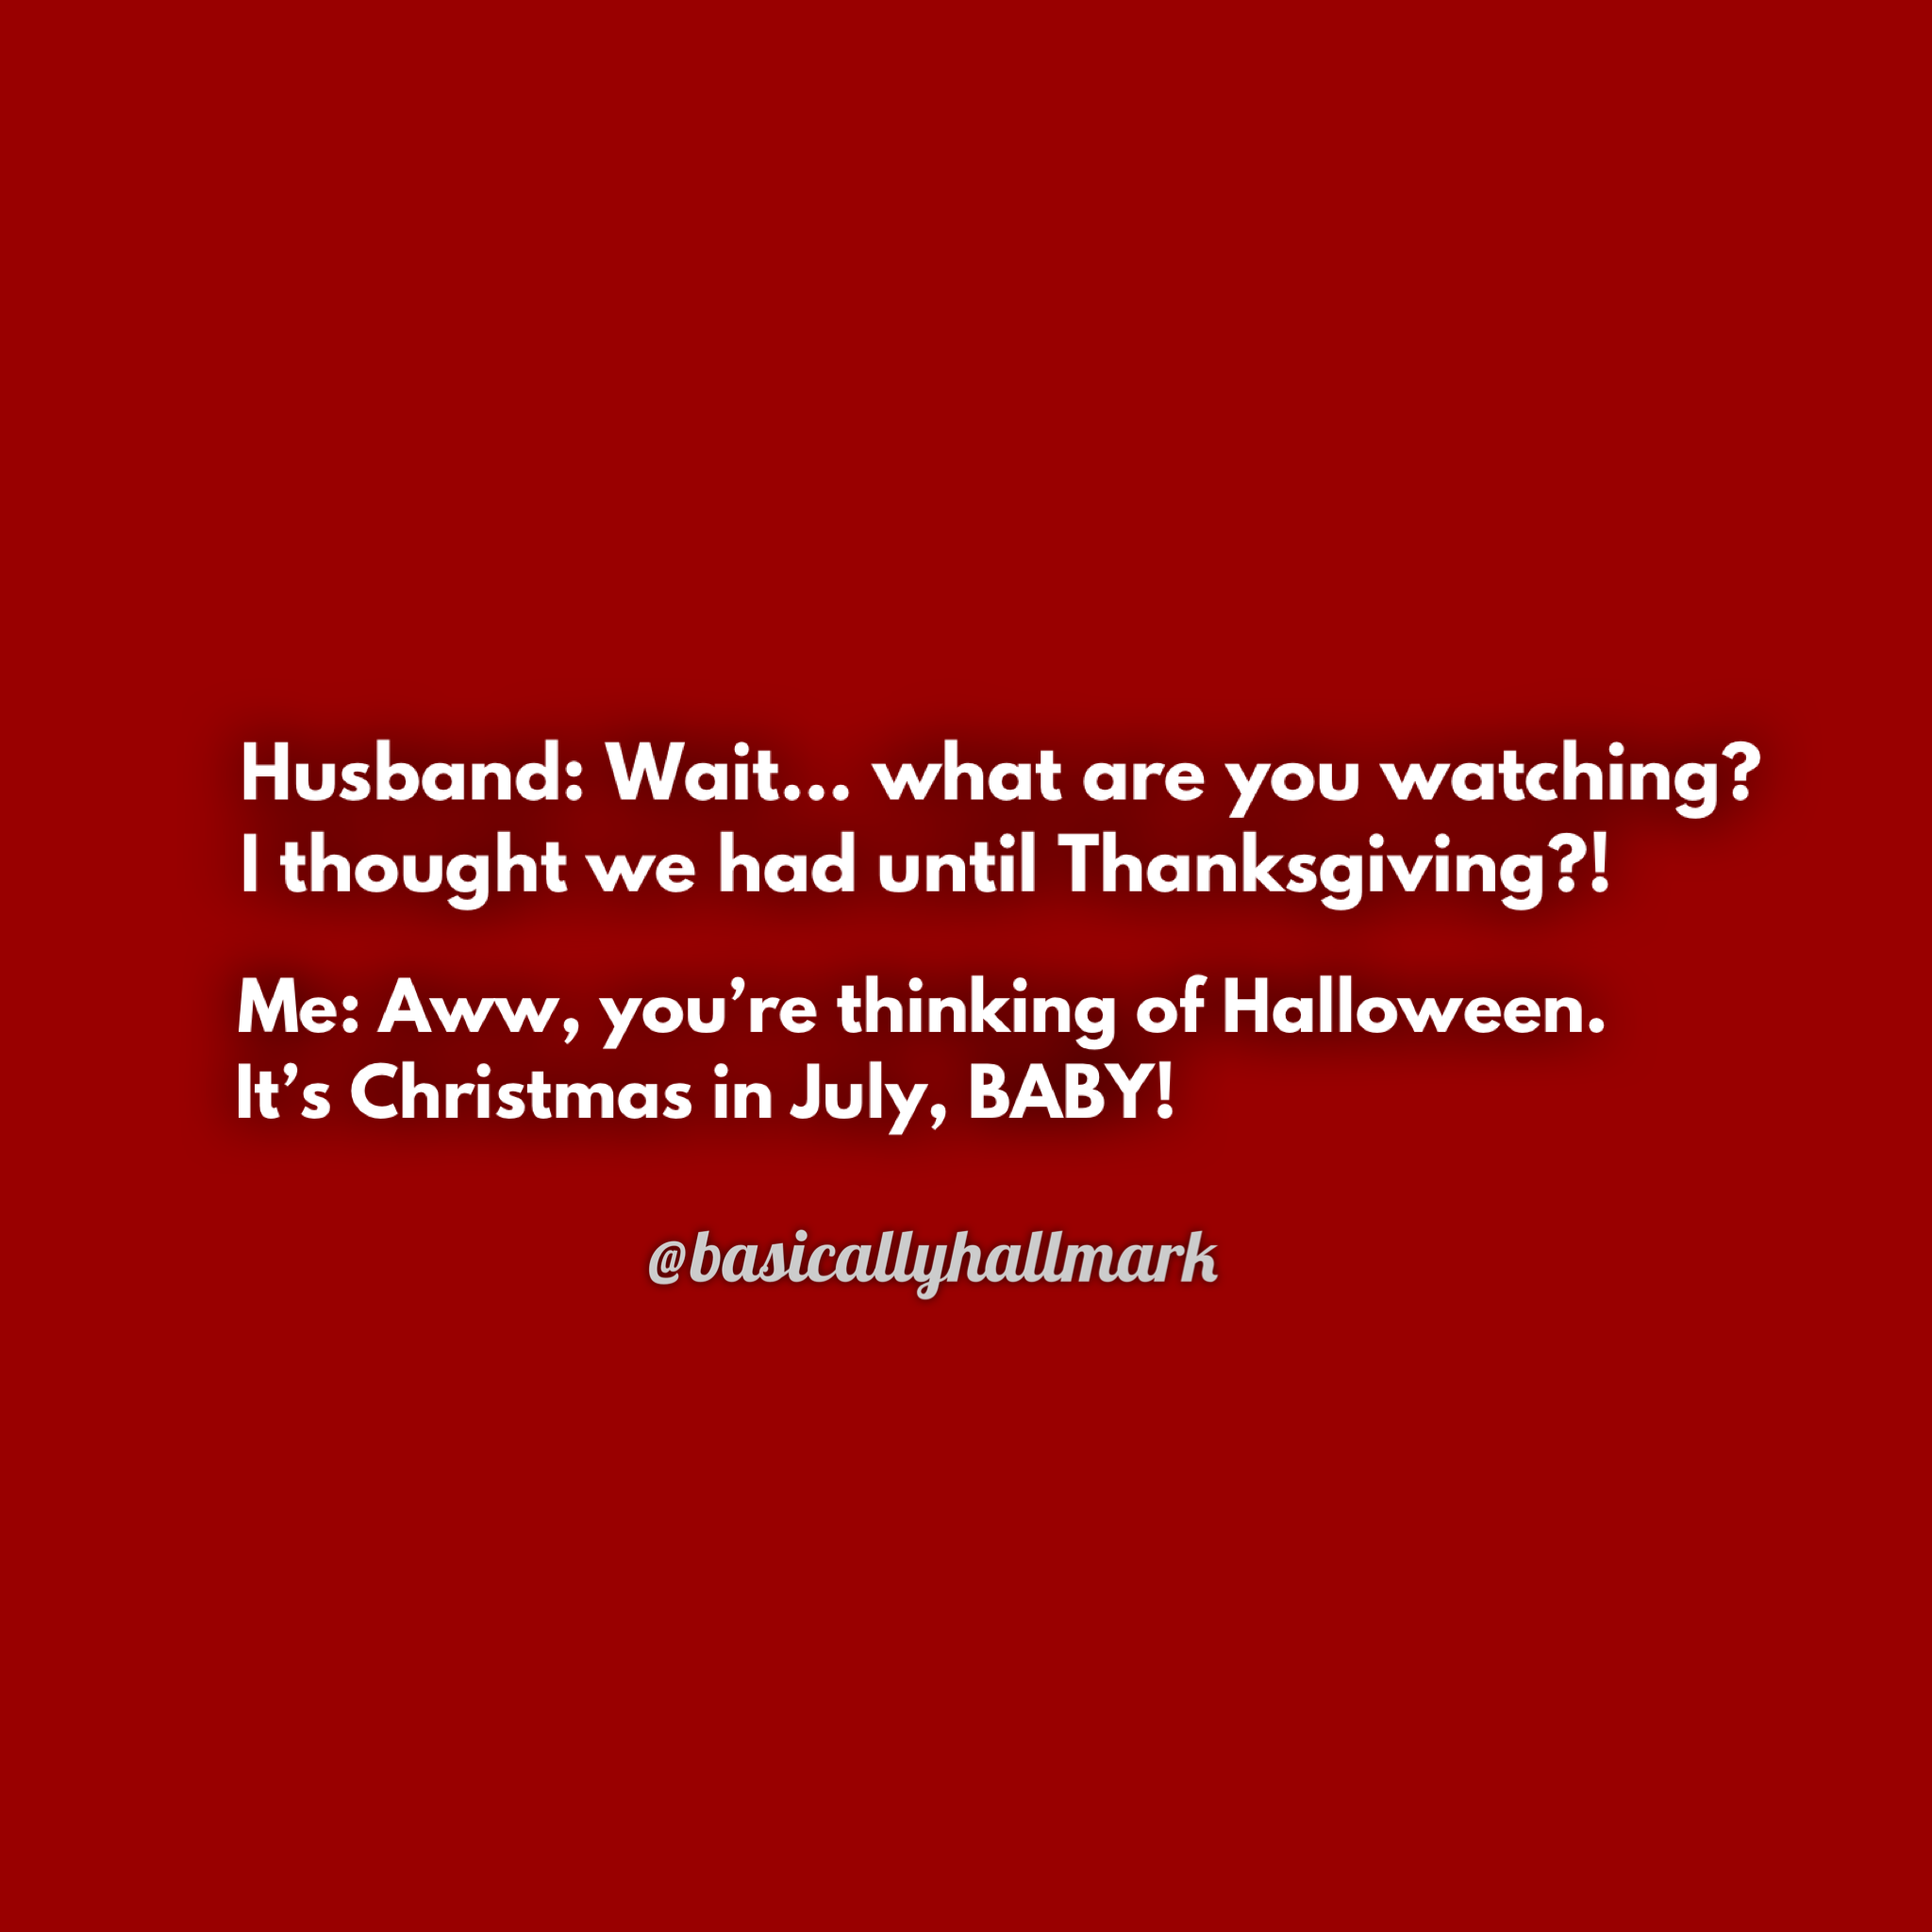 Christmas In July Hallmark Meme.Hallmark Christmas Funny Memes Quotes Humor Funnymemes